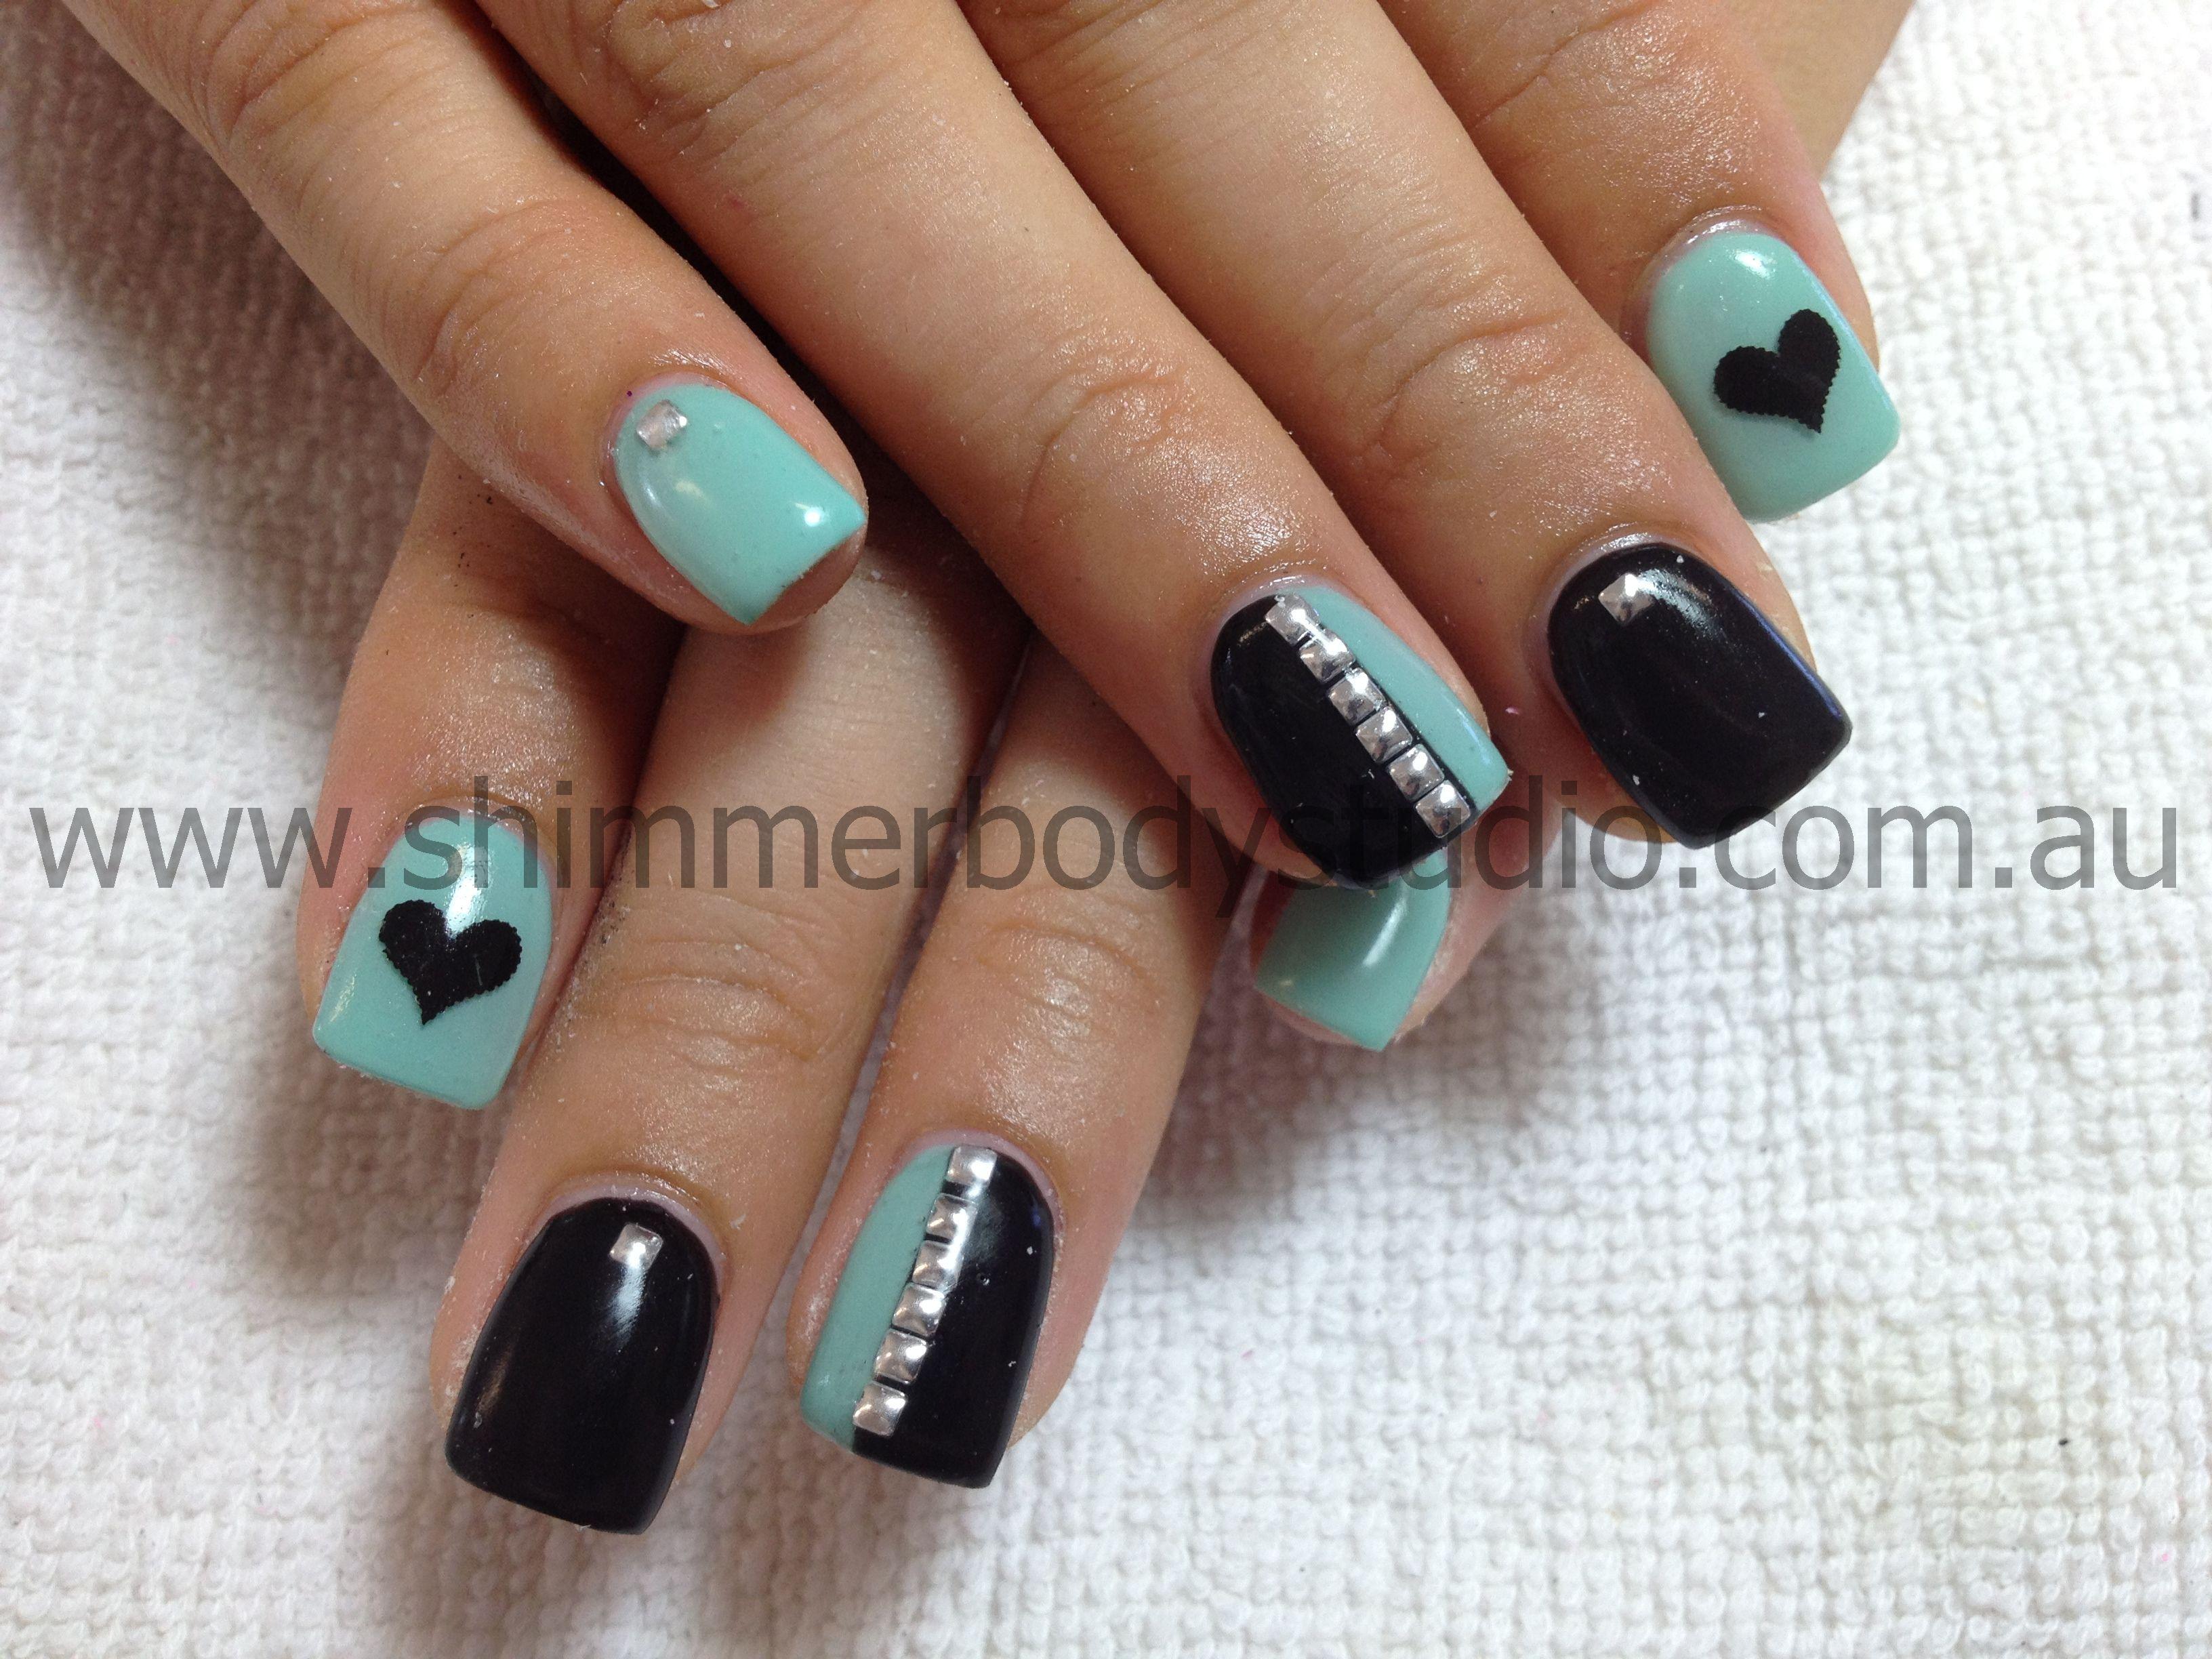 Gel nails colour nails black nails turqoise nails studs gel nails colour nails black nails turqoise nails studs silver studs prinsesfo Image collections